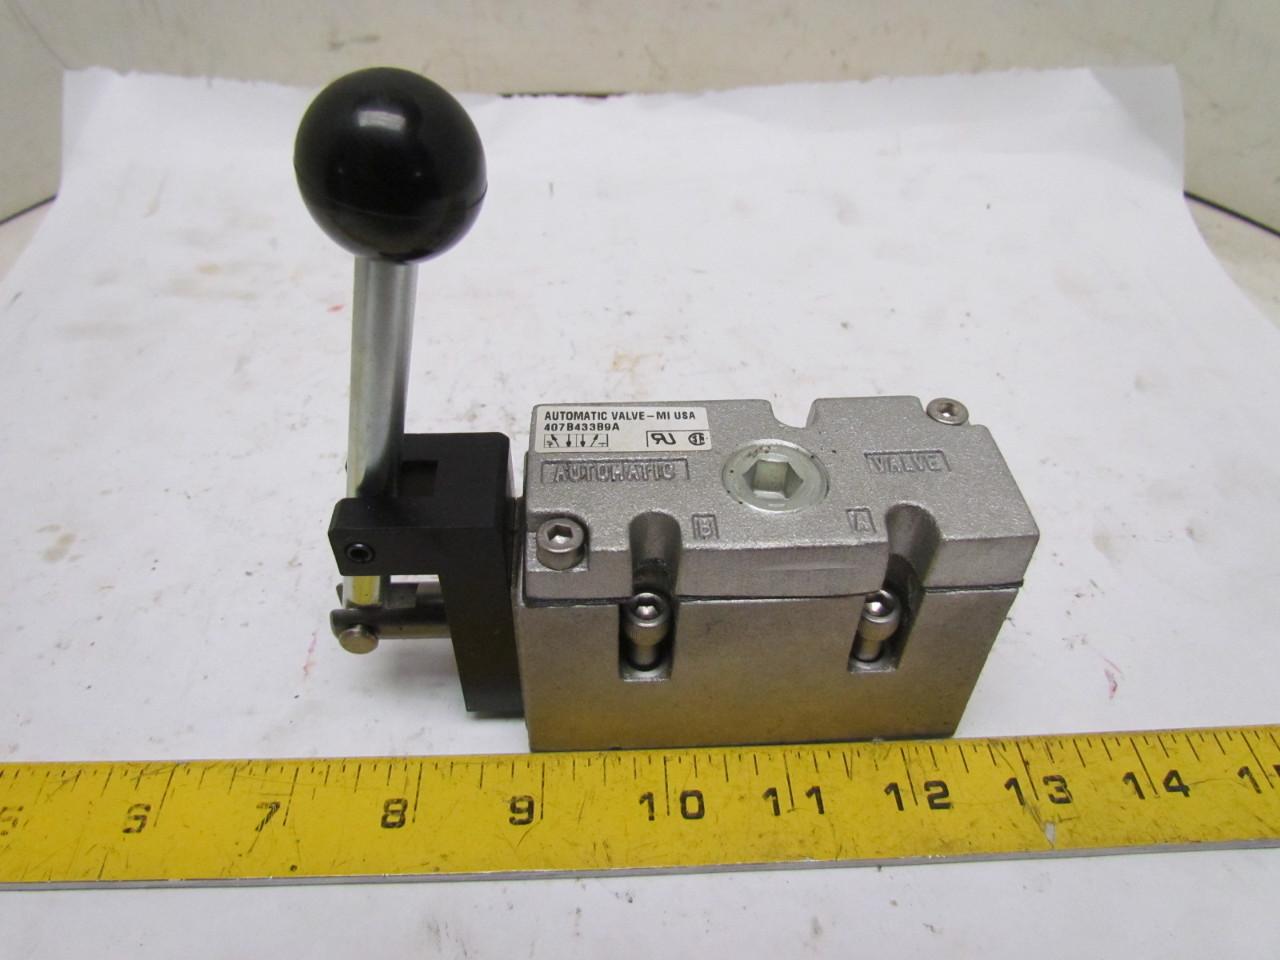 Pneumatic Lever Valve : B a position air pneumatic sae spool